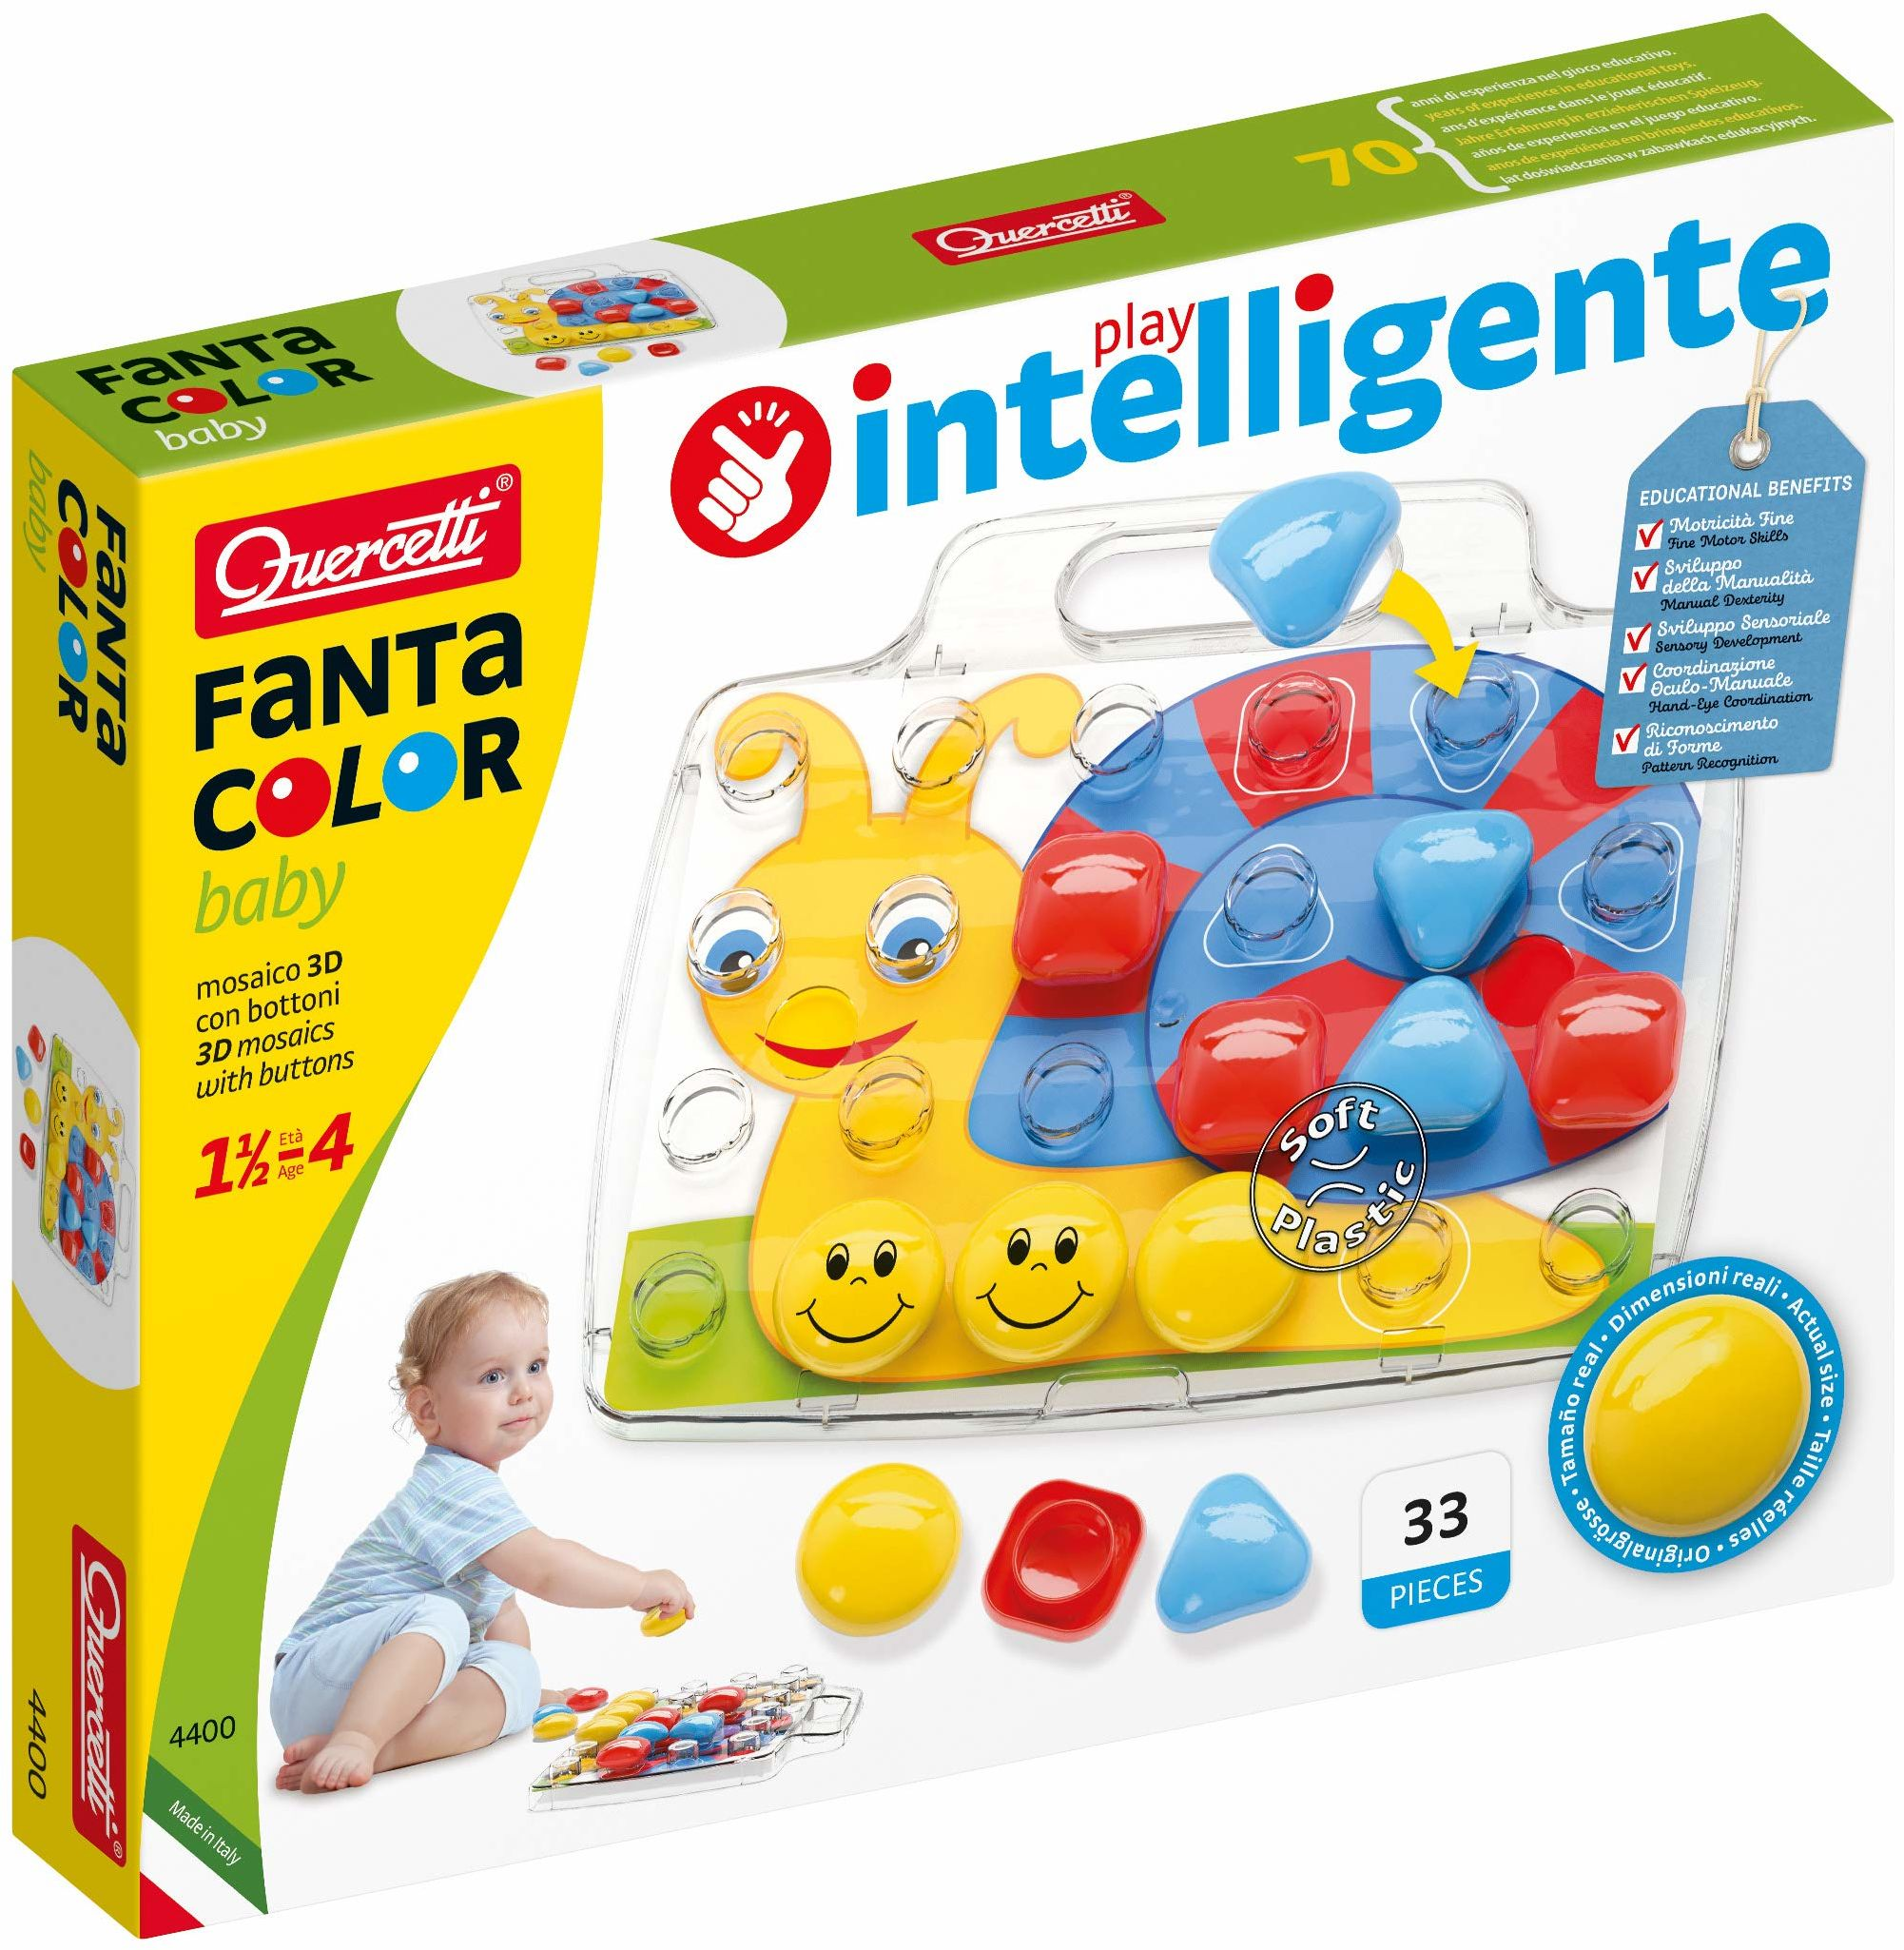 beluga Baby Basic 4400 pikseli, 24 Quercetti 4400 pikseli, kolorowy